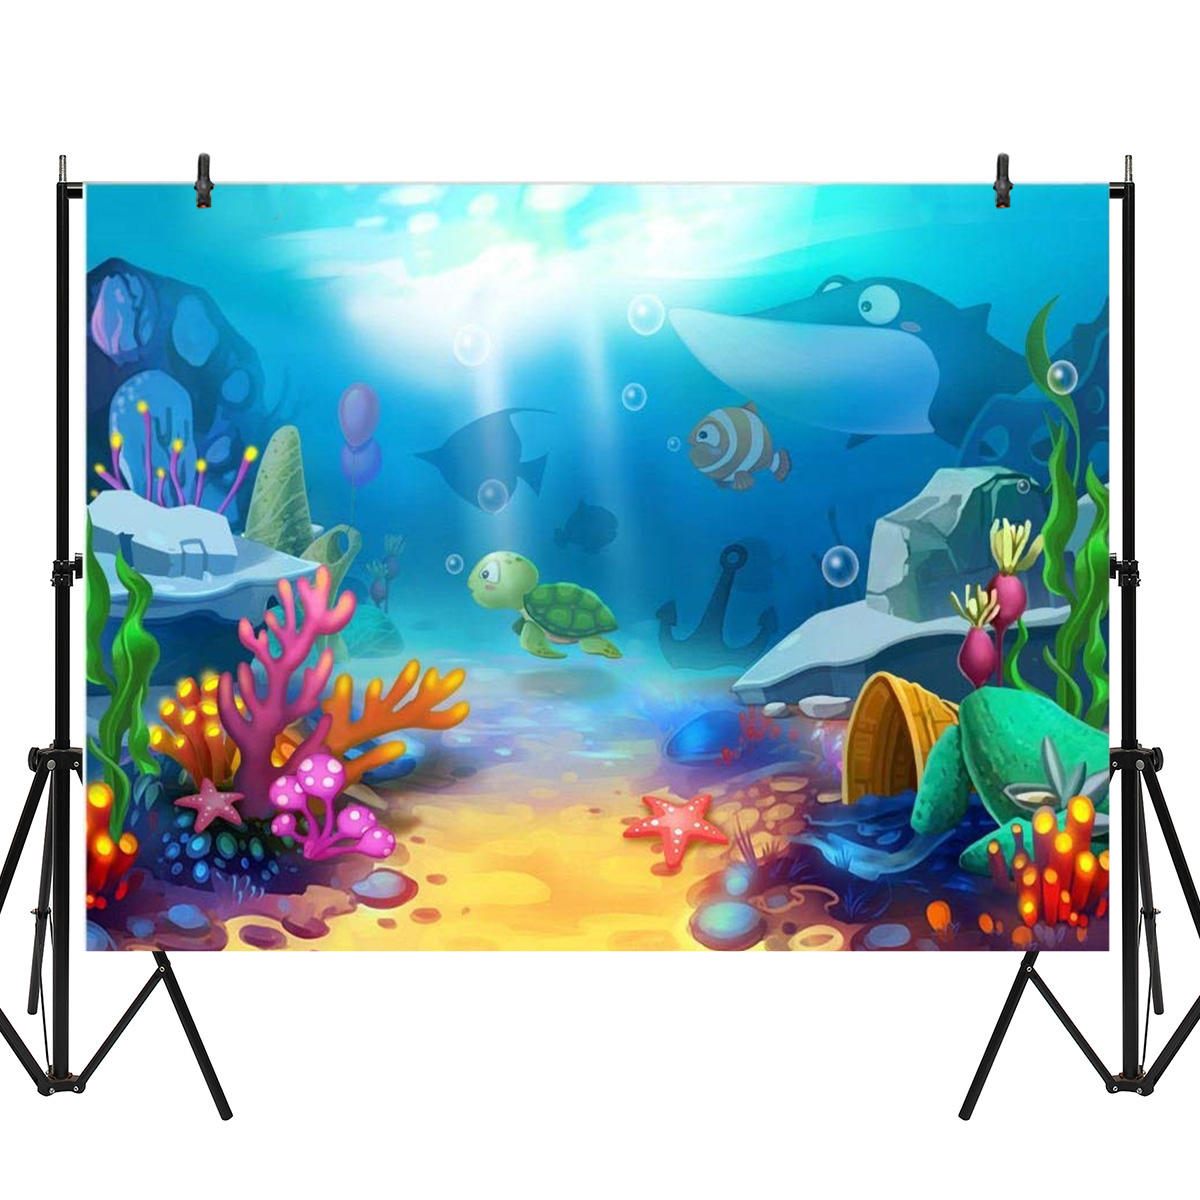 5x3FT 7x5FT 8x6FT Cartoon Sea Fish Photography Backdrop Background Studio Prop, Banggood  - buy with discount